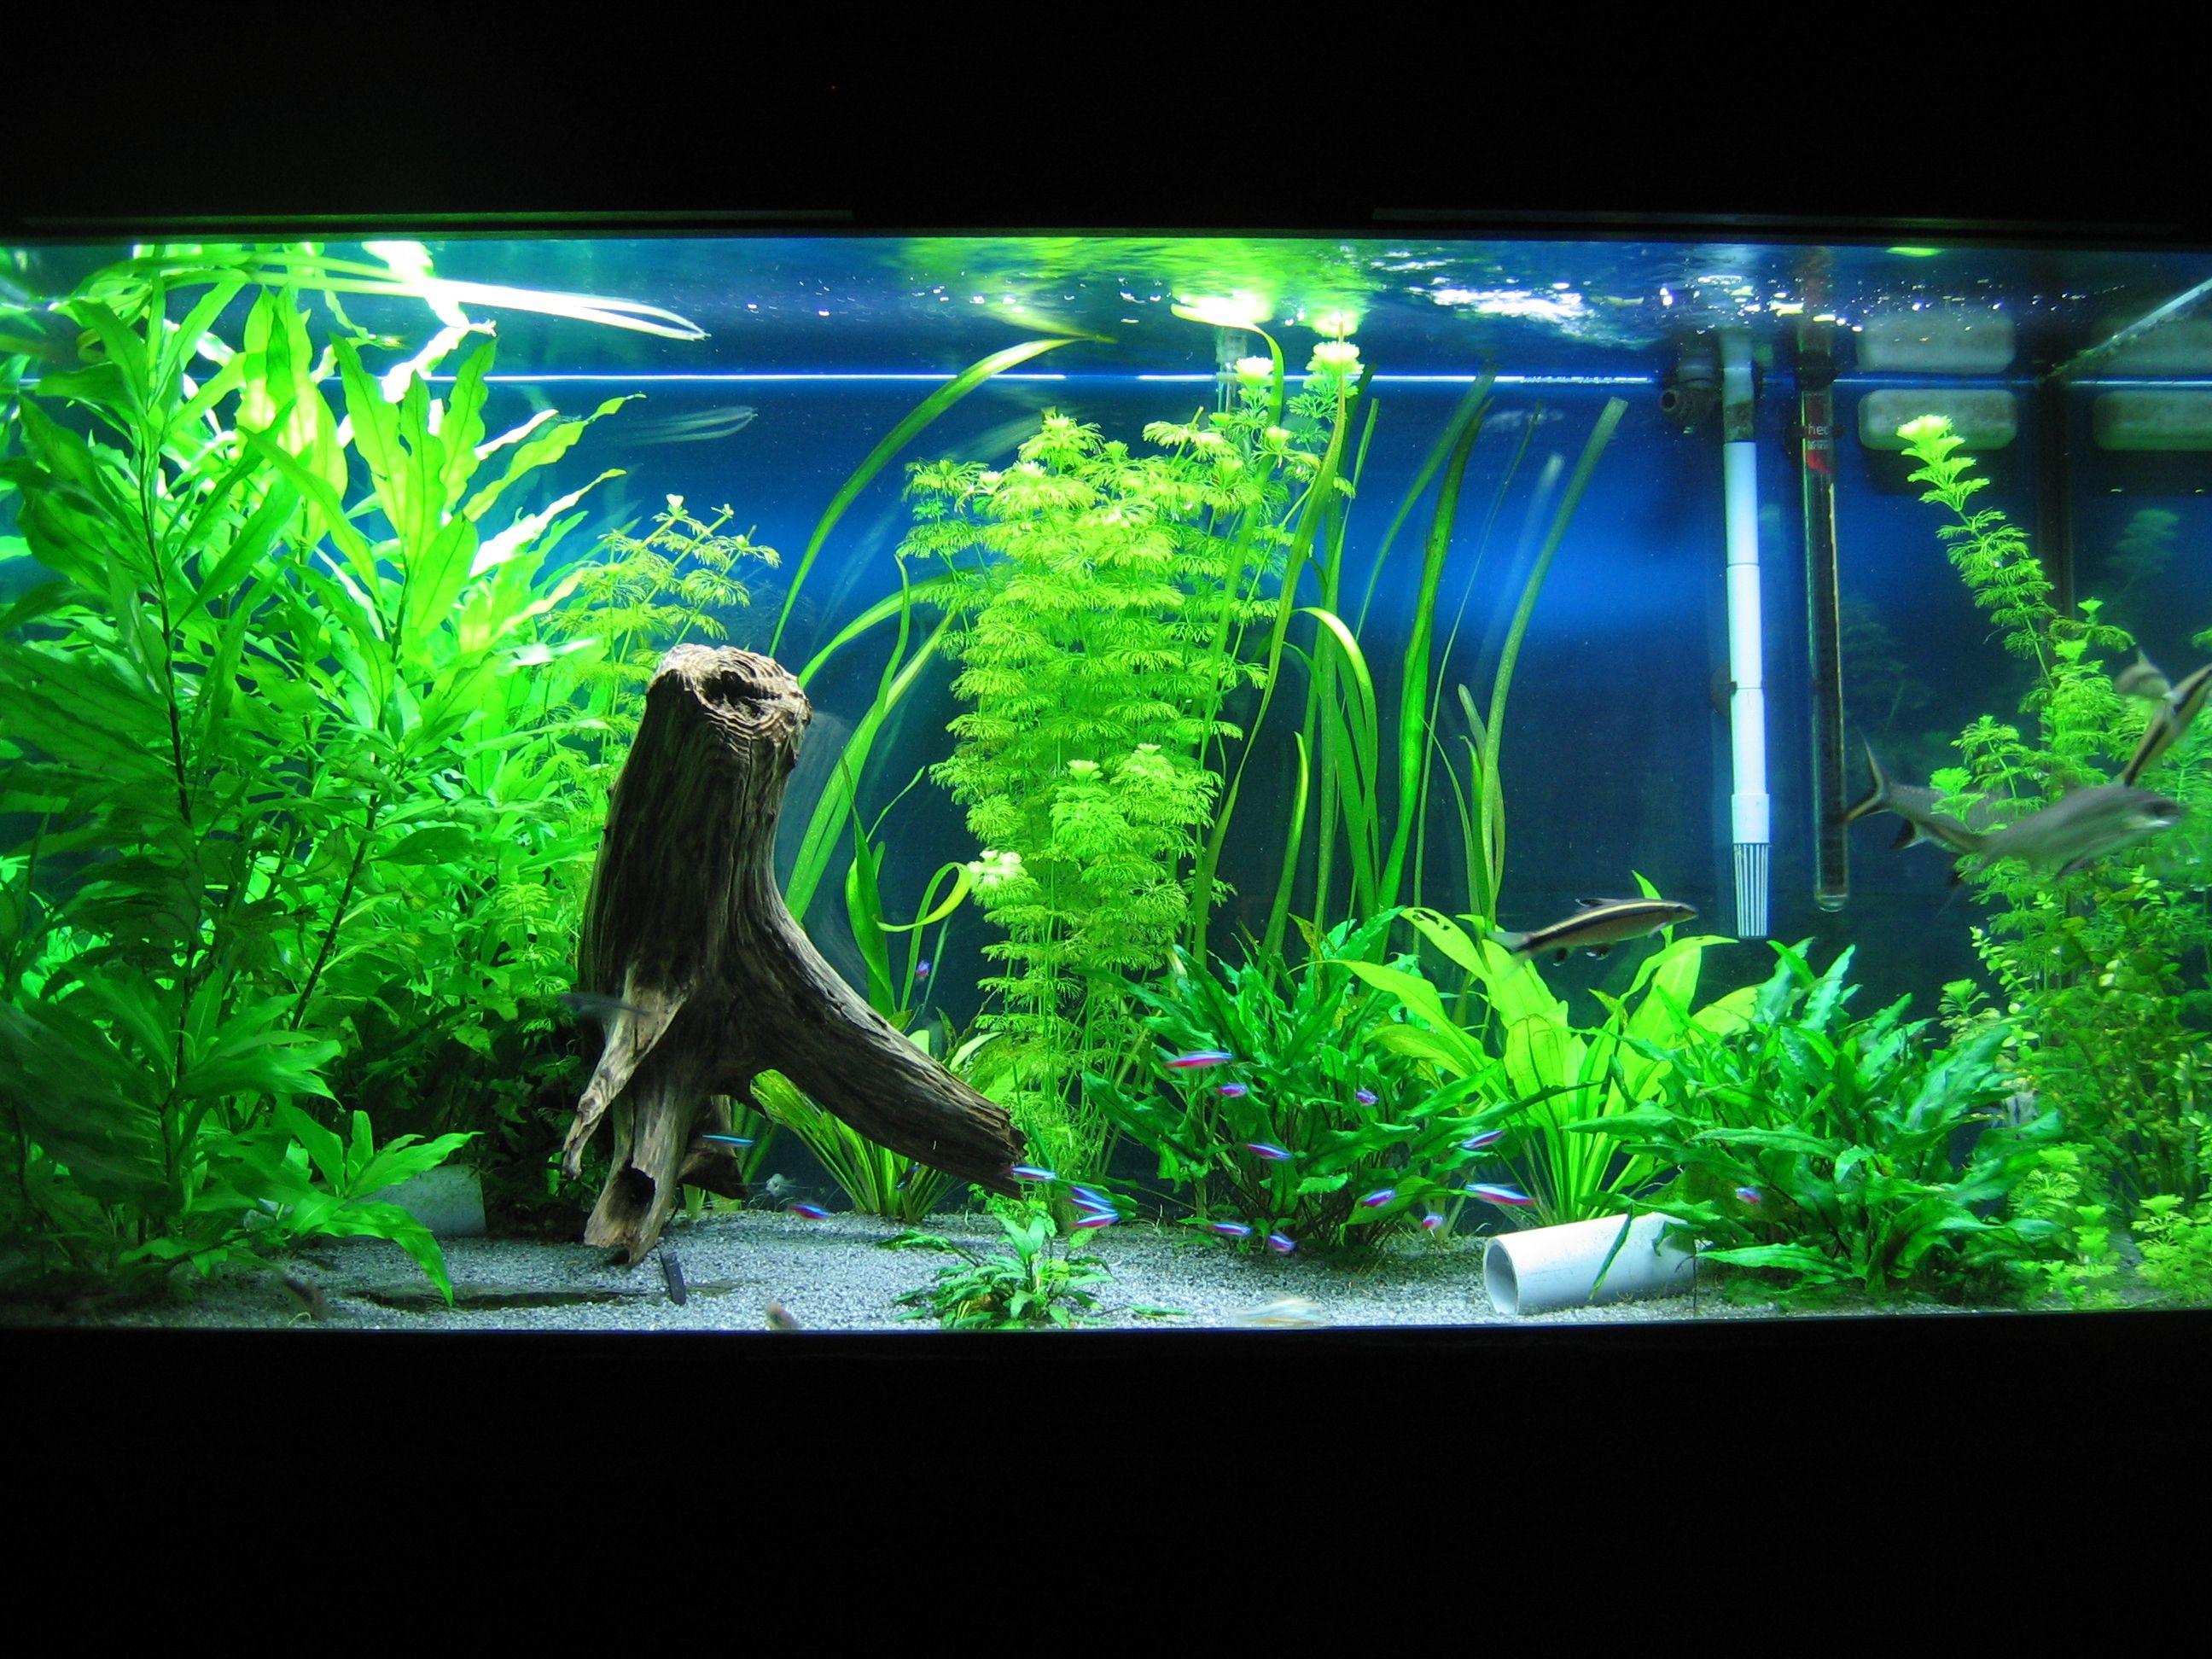 fish tank decor ideas fish tank ideas Pinterest